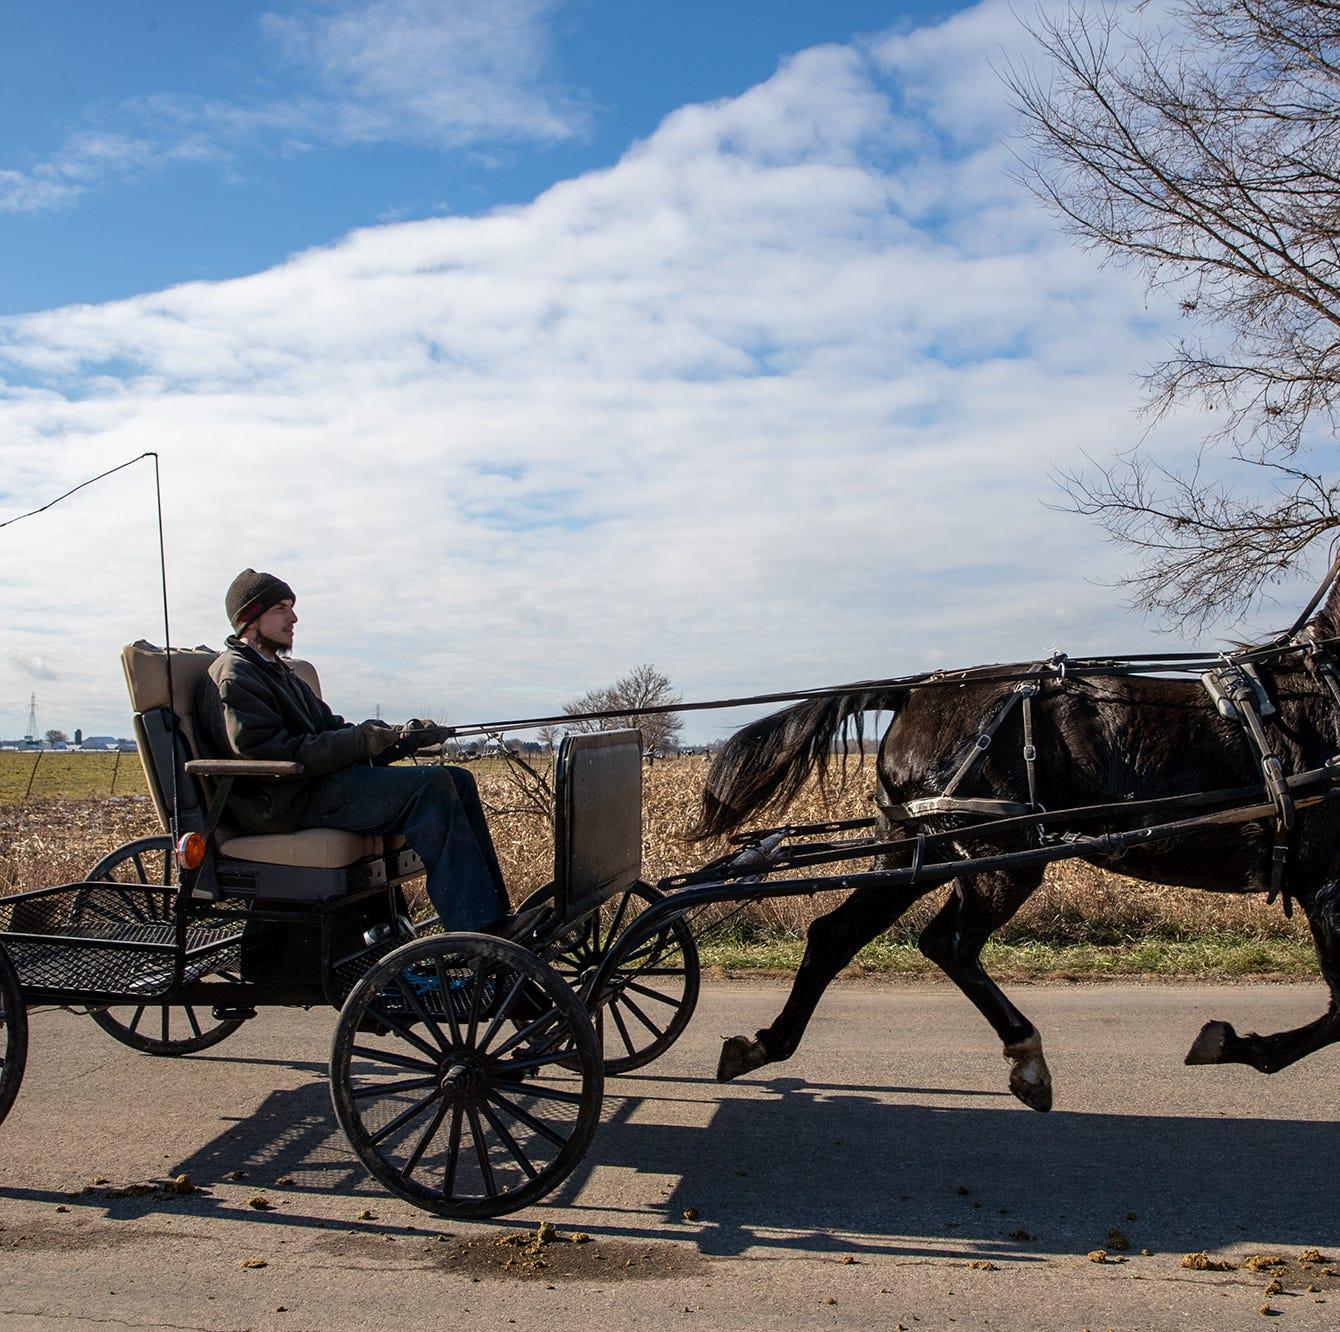 An Amish man rides down a road near Shipshewana, Ind., on Tuesday, Nov. 20, 2018.